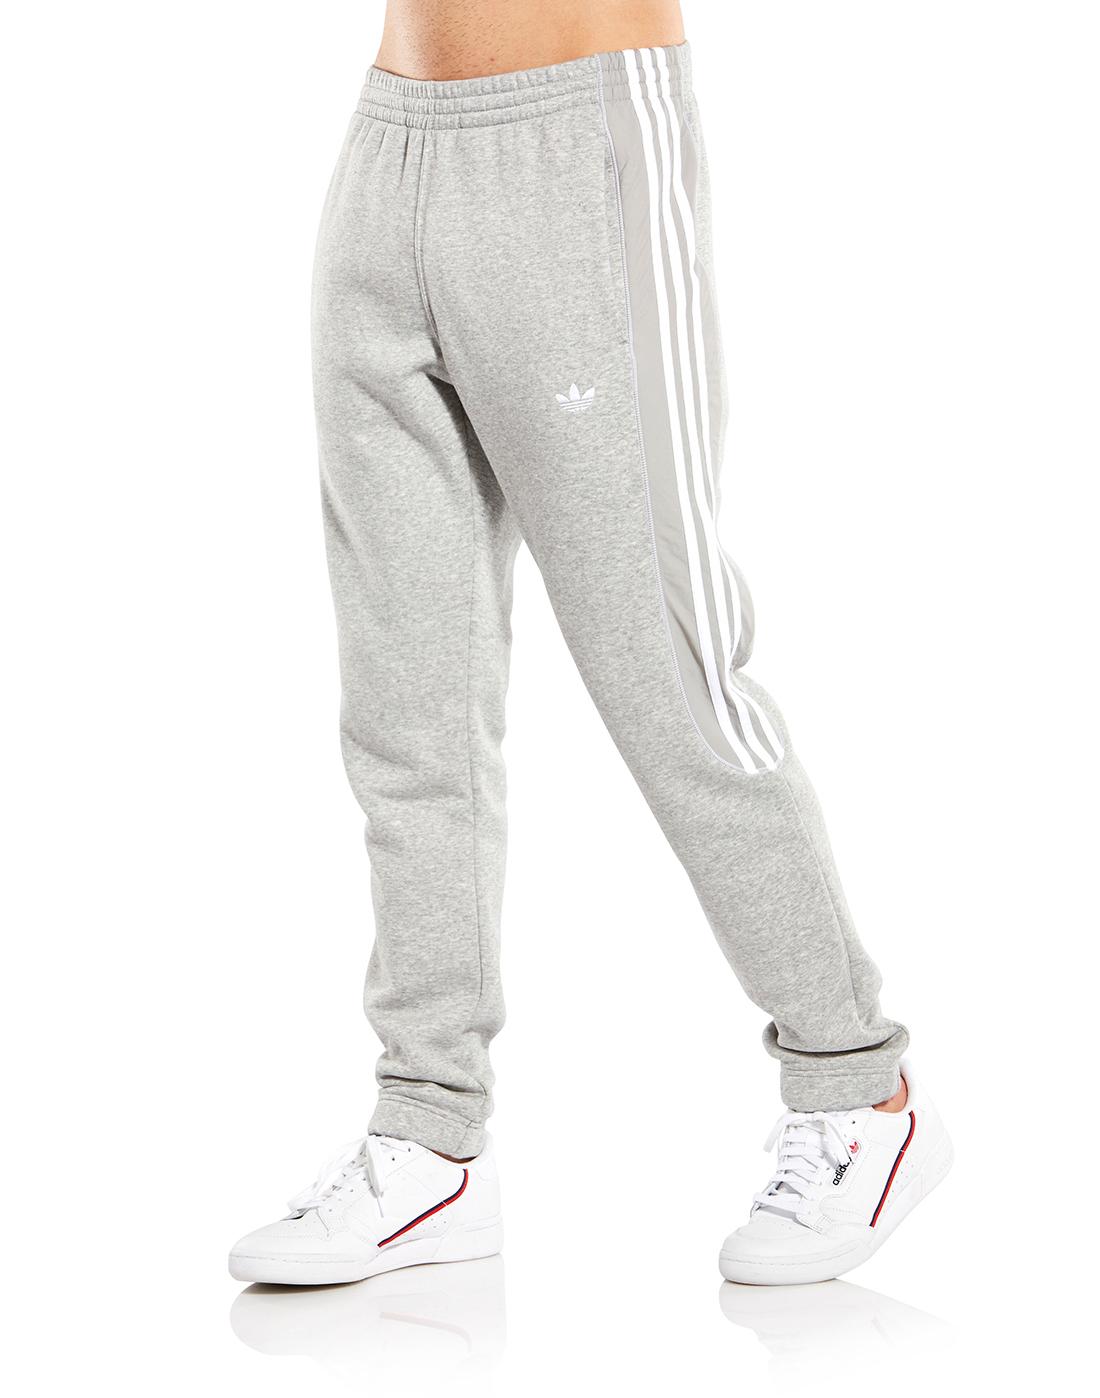 bcc89bffb3ab adidas Originals. Mens Radkin Jogger. Mens Radkin Jogger ...